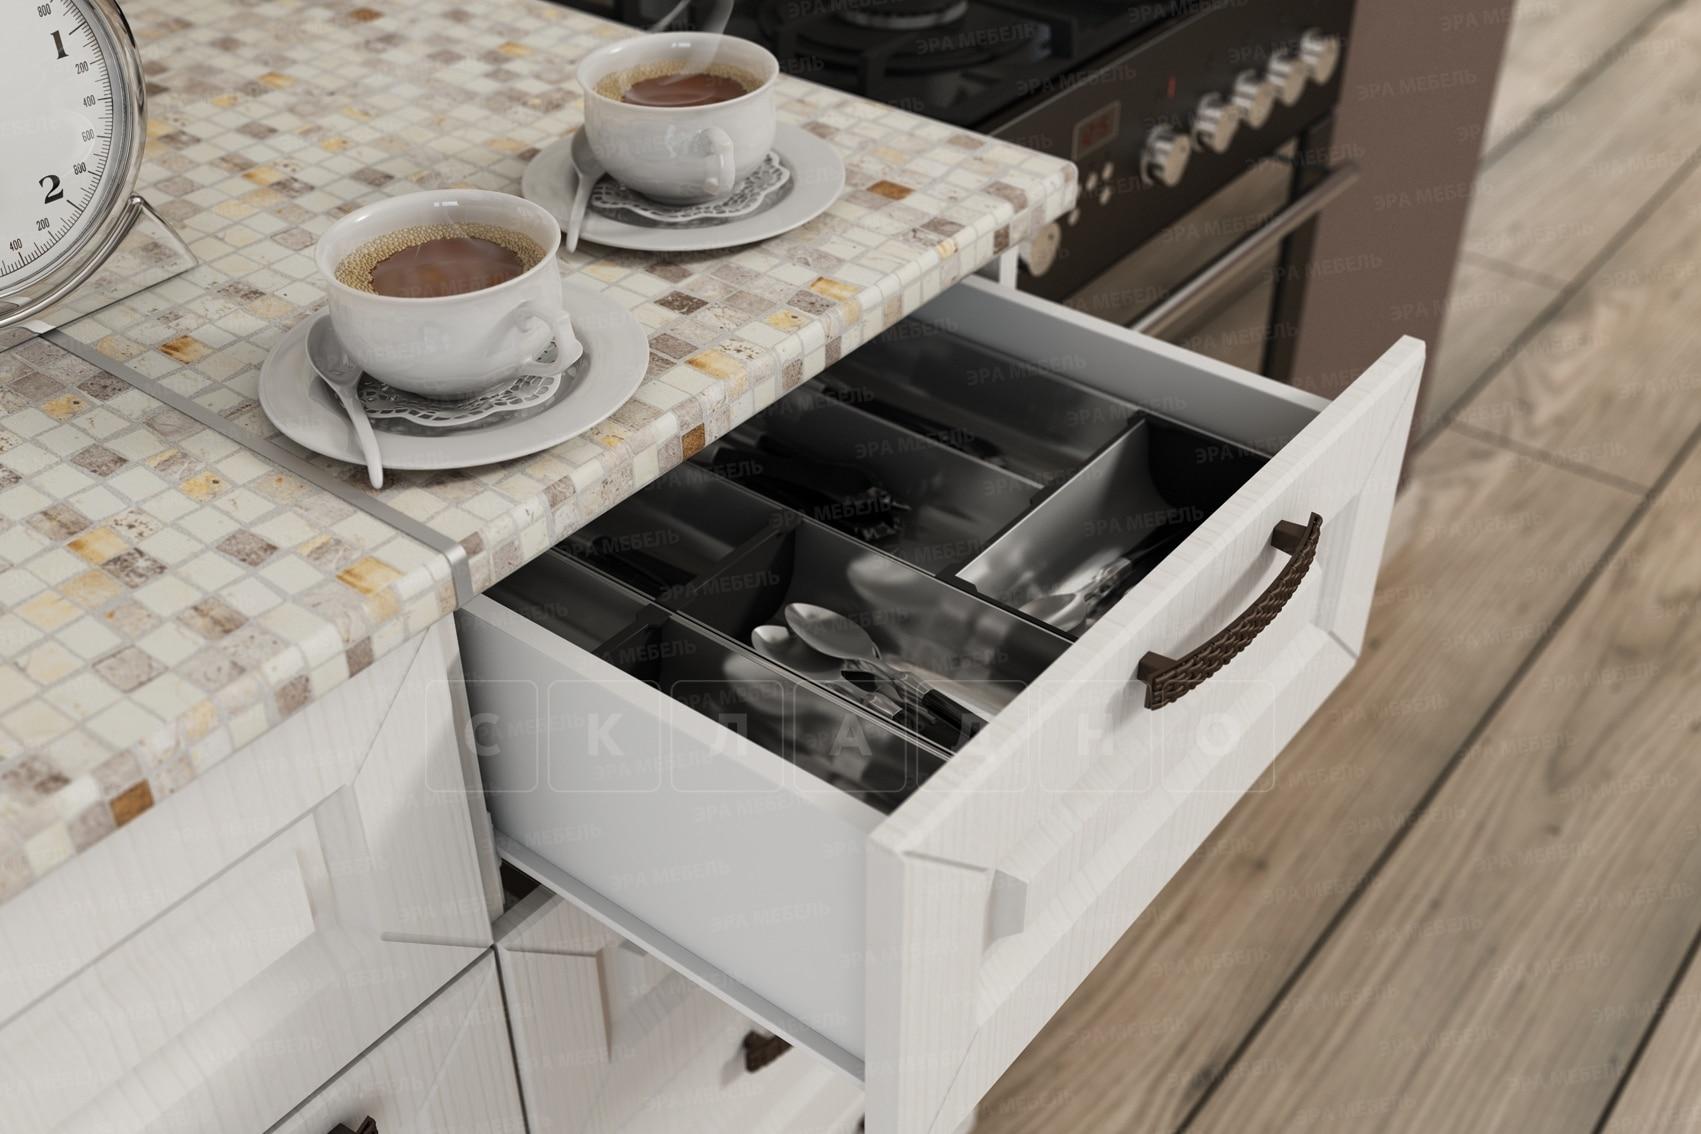 Кухня угловая Агава 1,85х2,85м фото 3 | интернет-магазин Складно